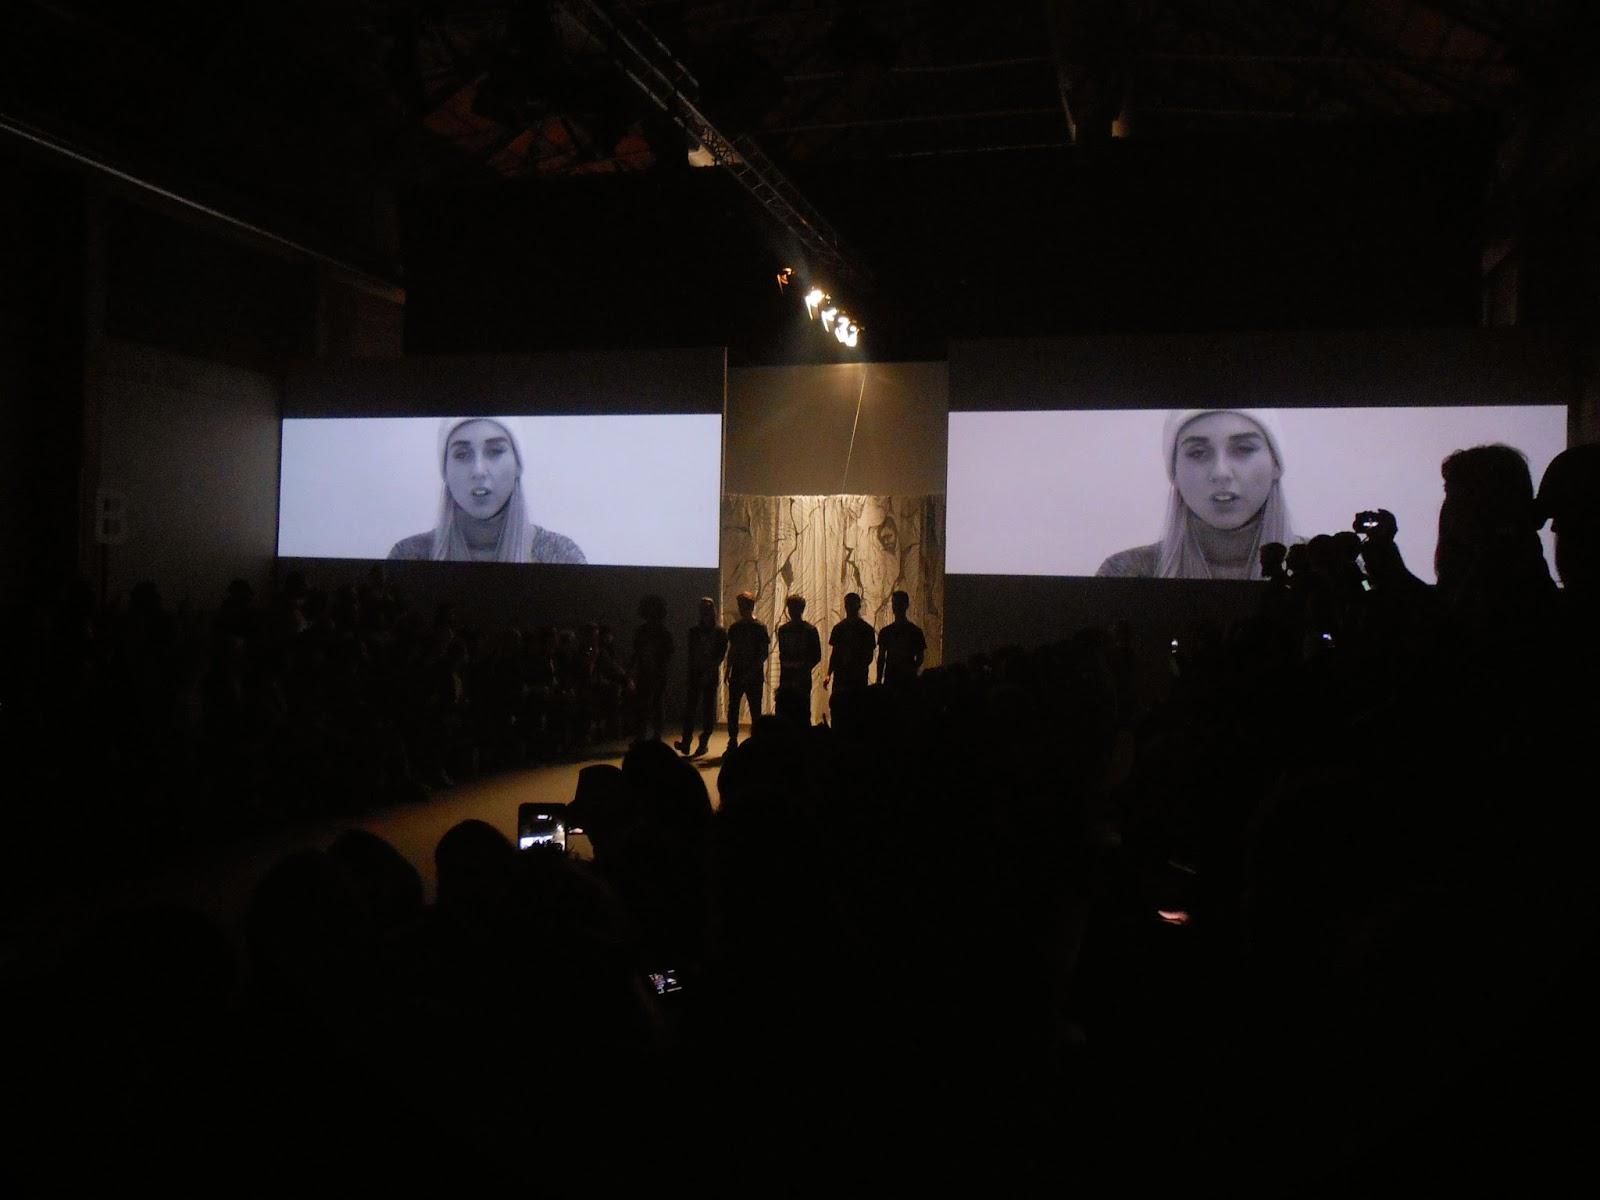 Evan Menswear at Mercedez-Benz Fashion Week Amsterdam 2015